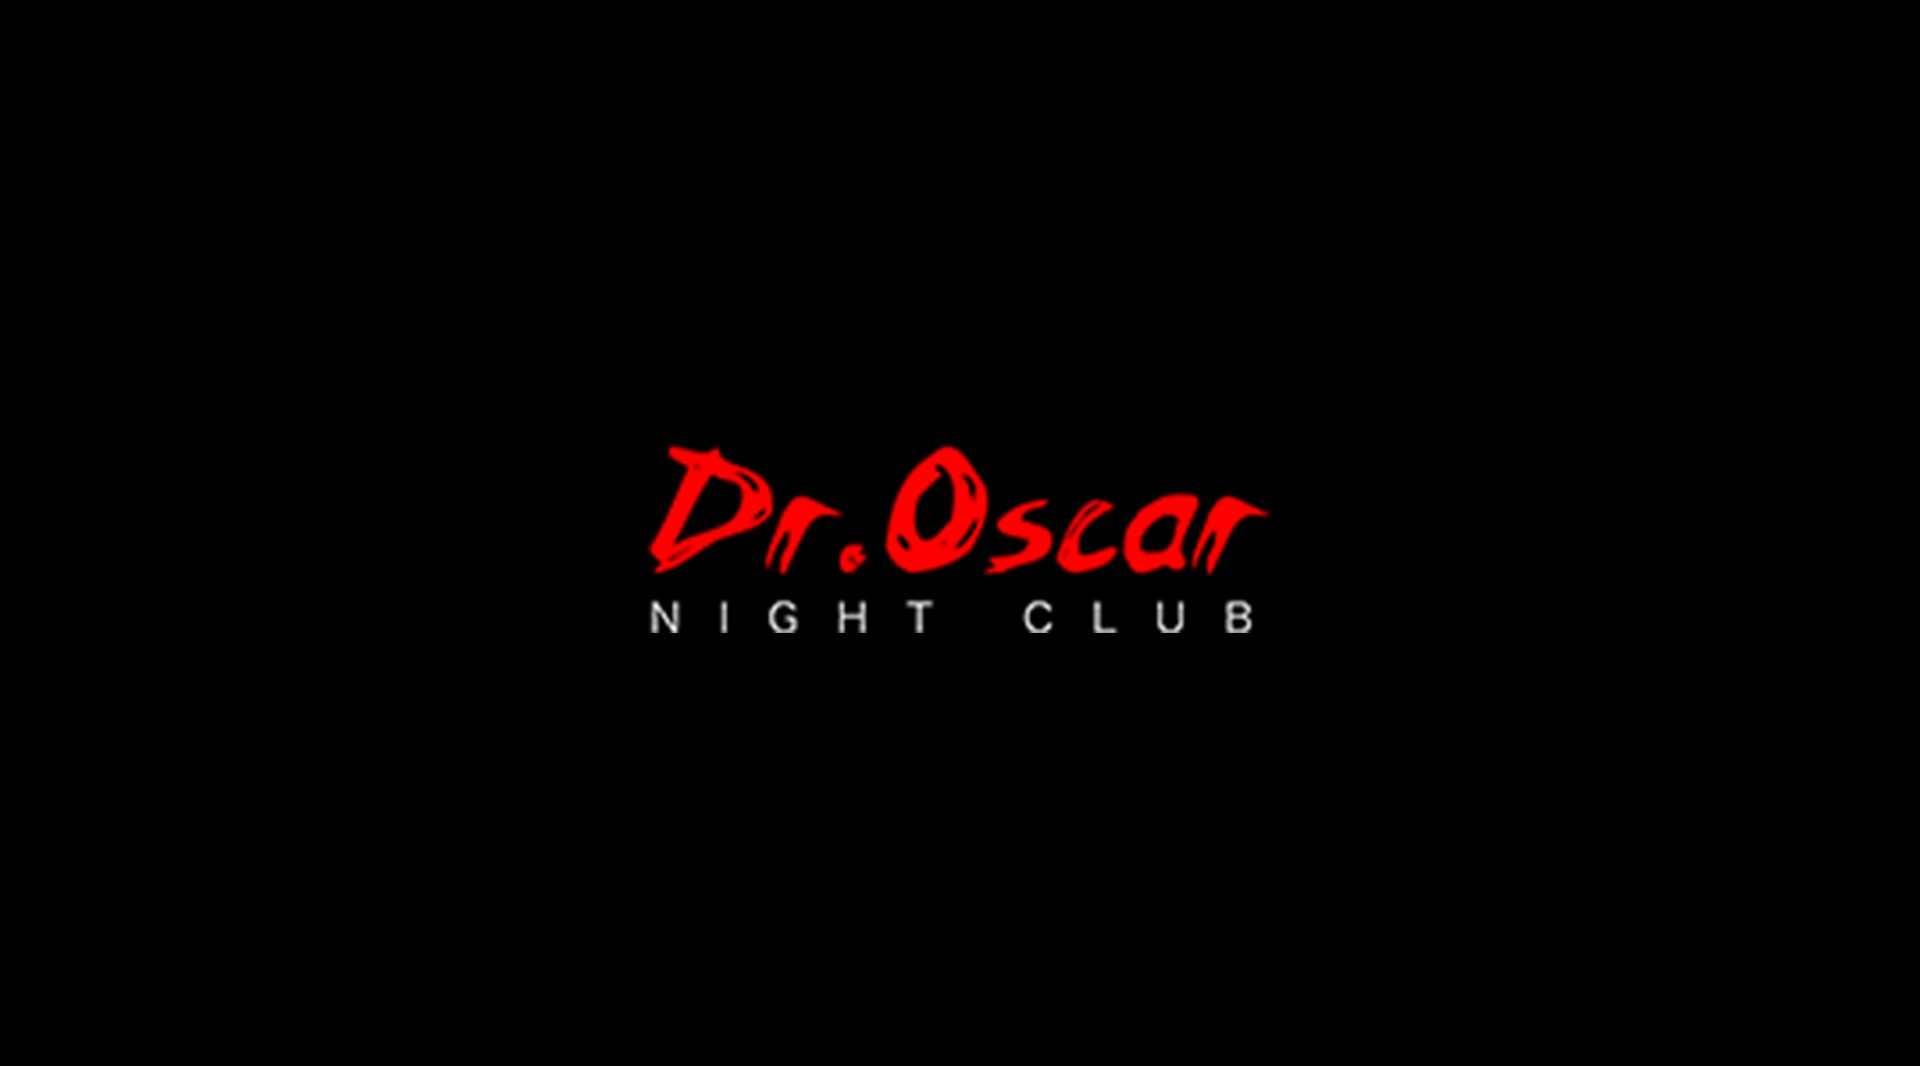 #Hello Yiyang# I'm Dr.Oscar